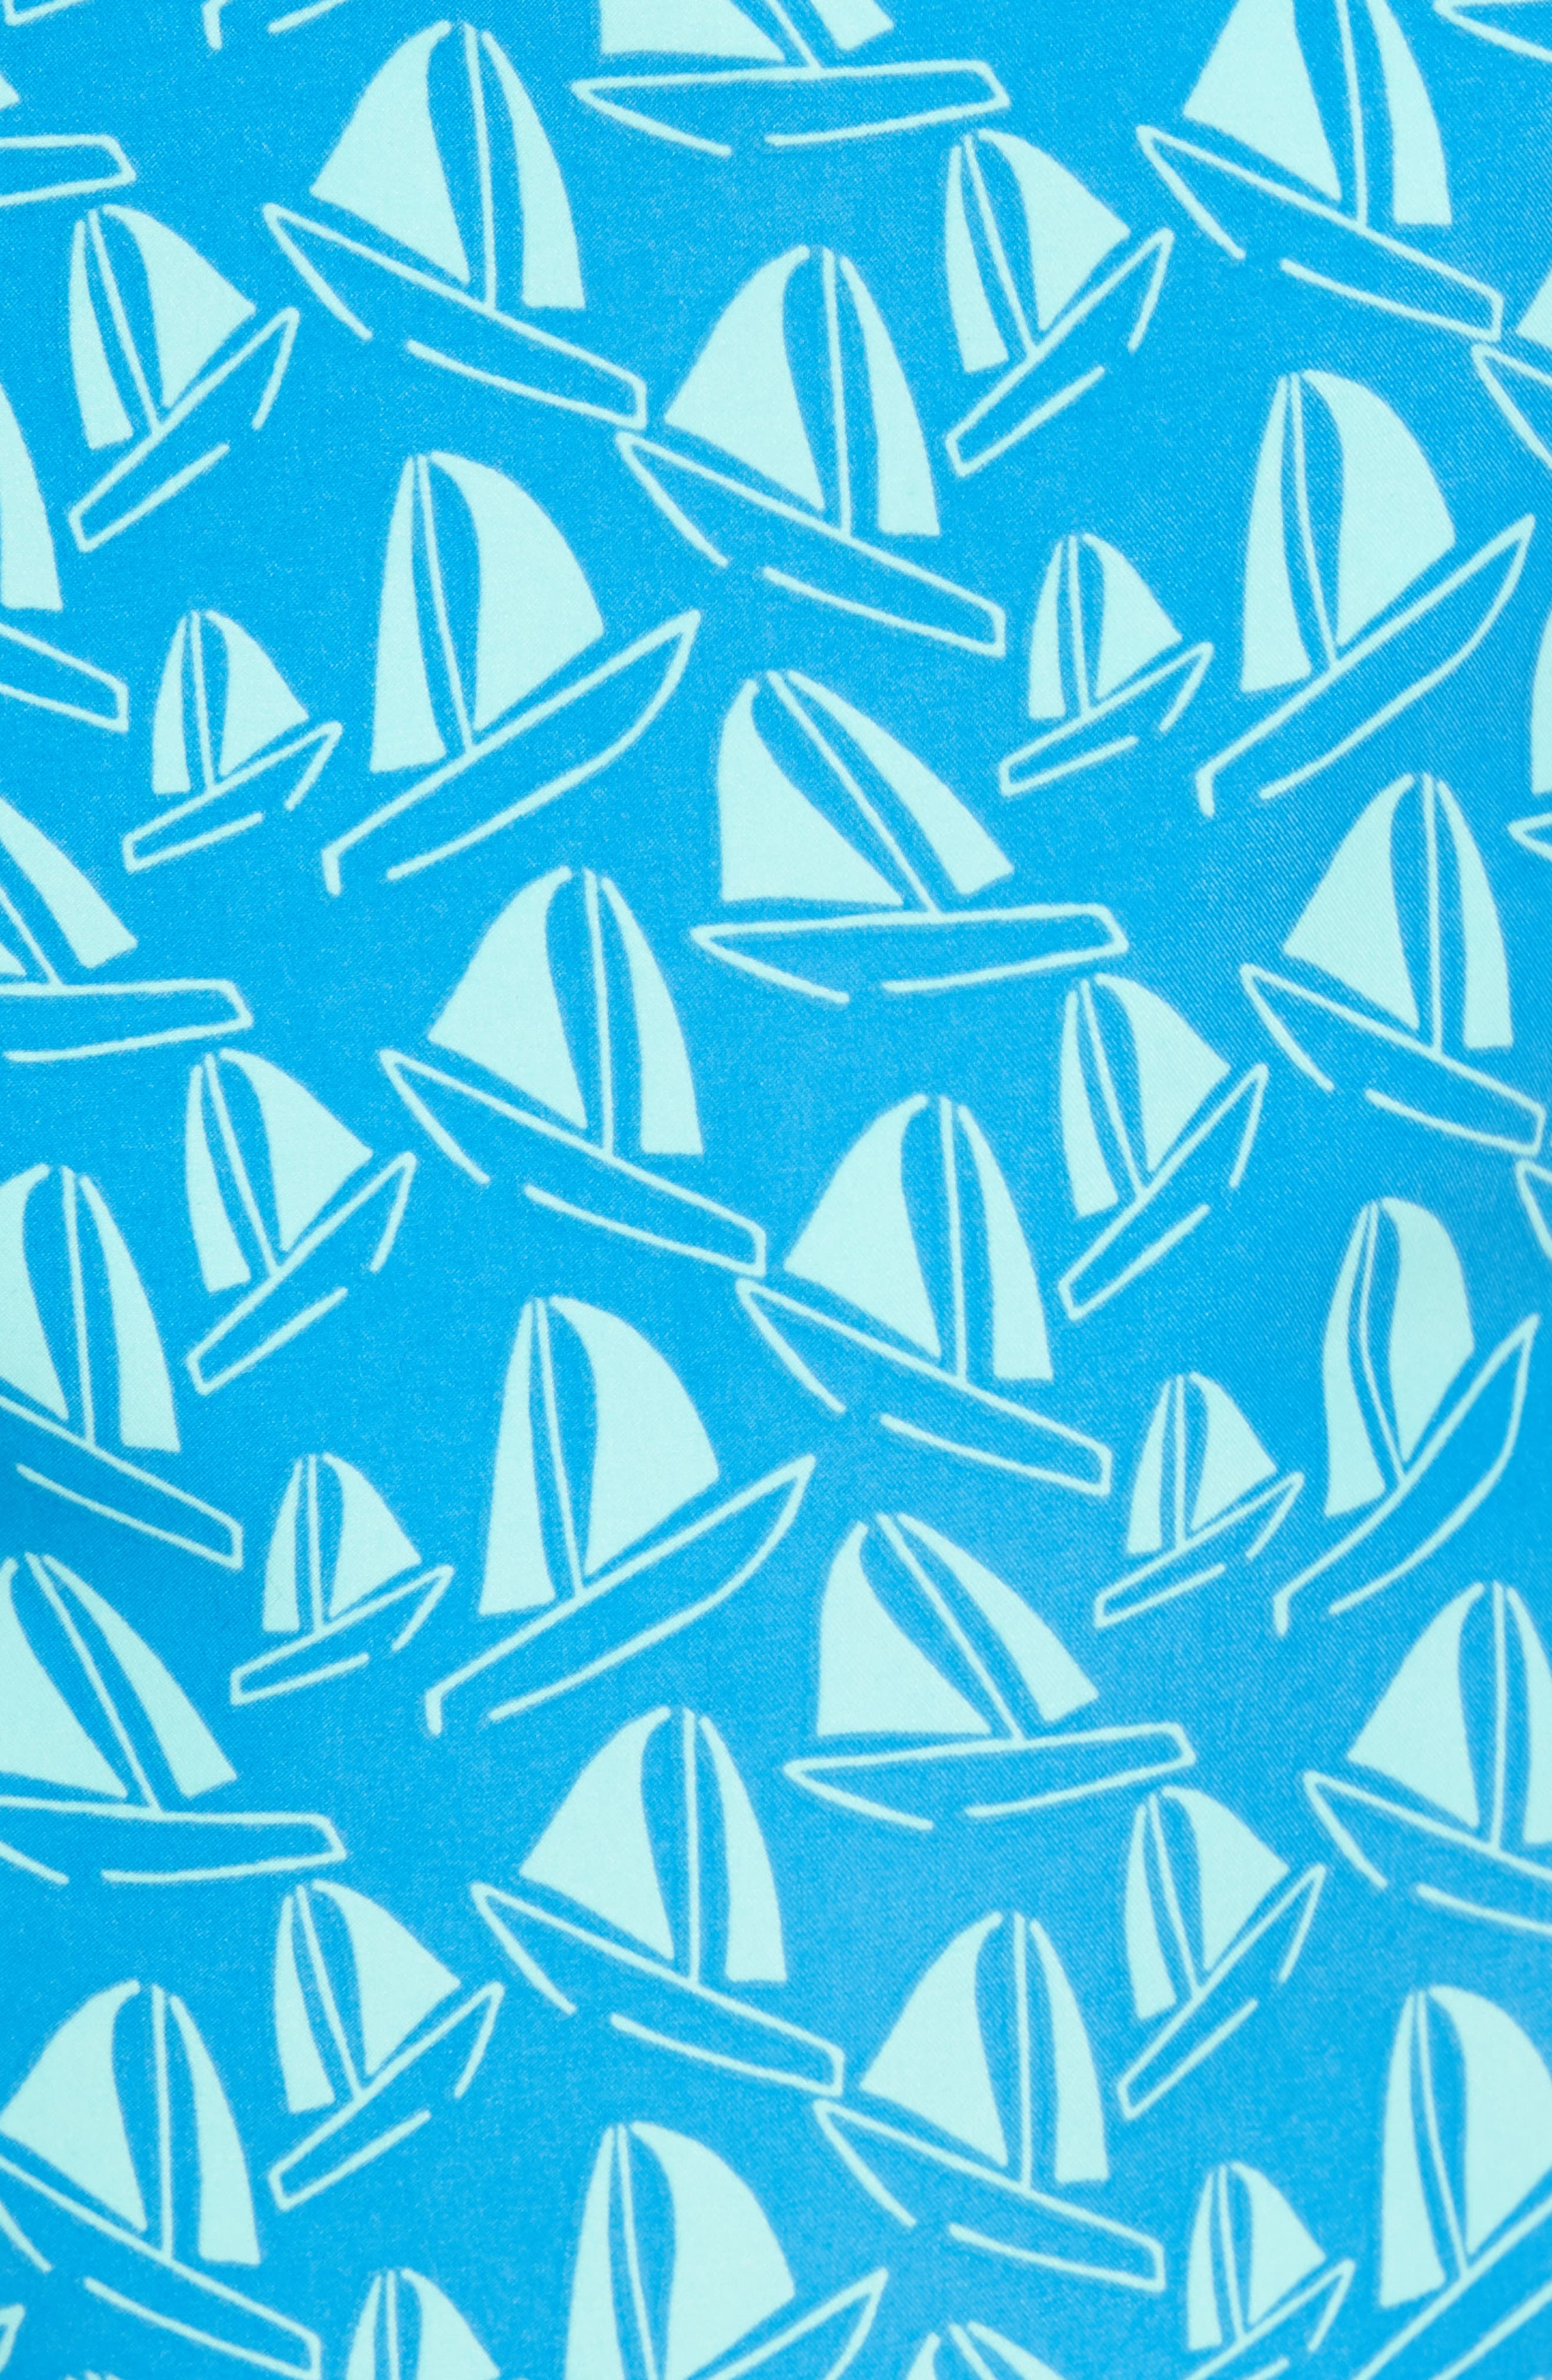 Boat Print Swim Trunks,                             Alternate thumbnail 5, color,                             420